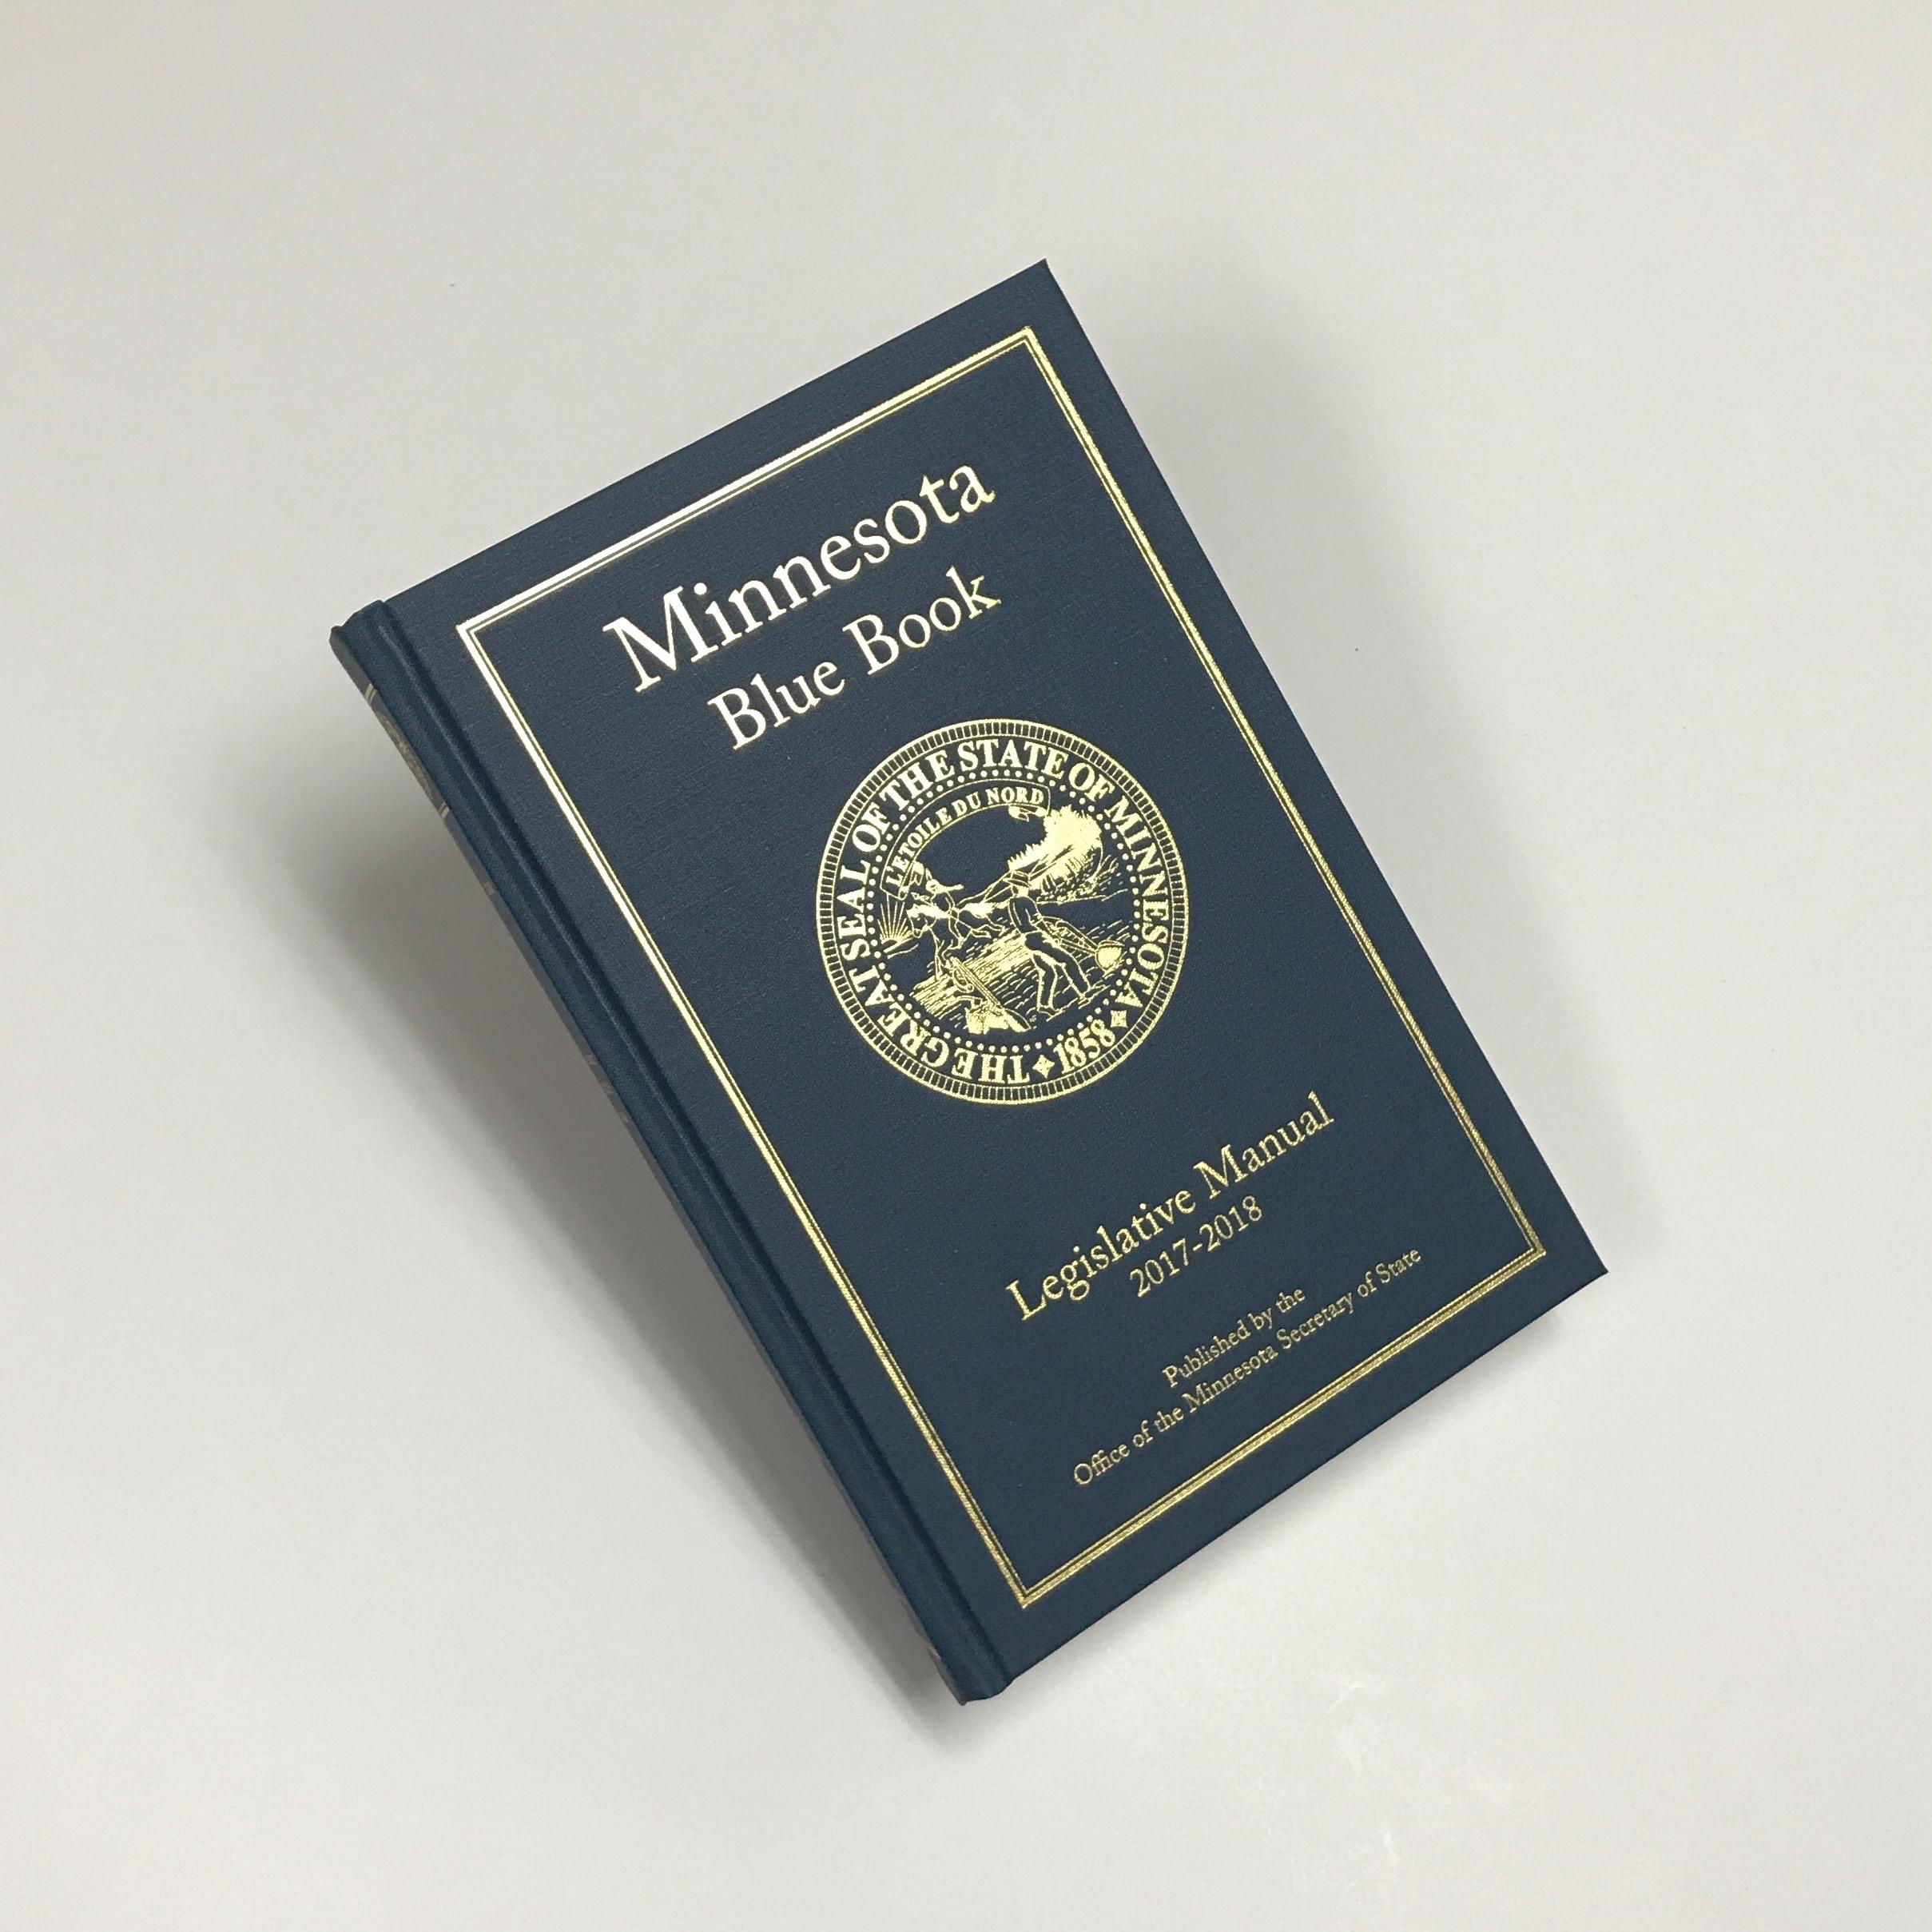 State government legislative book printed in Minnesota